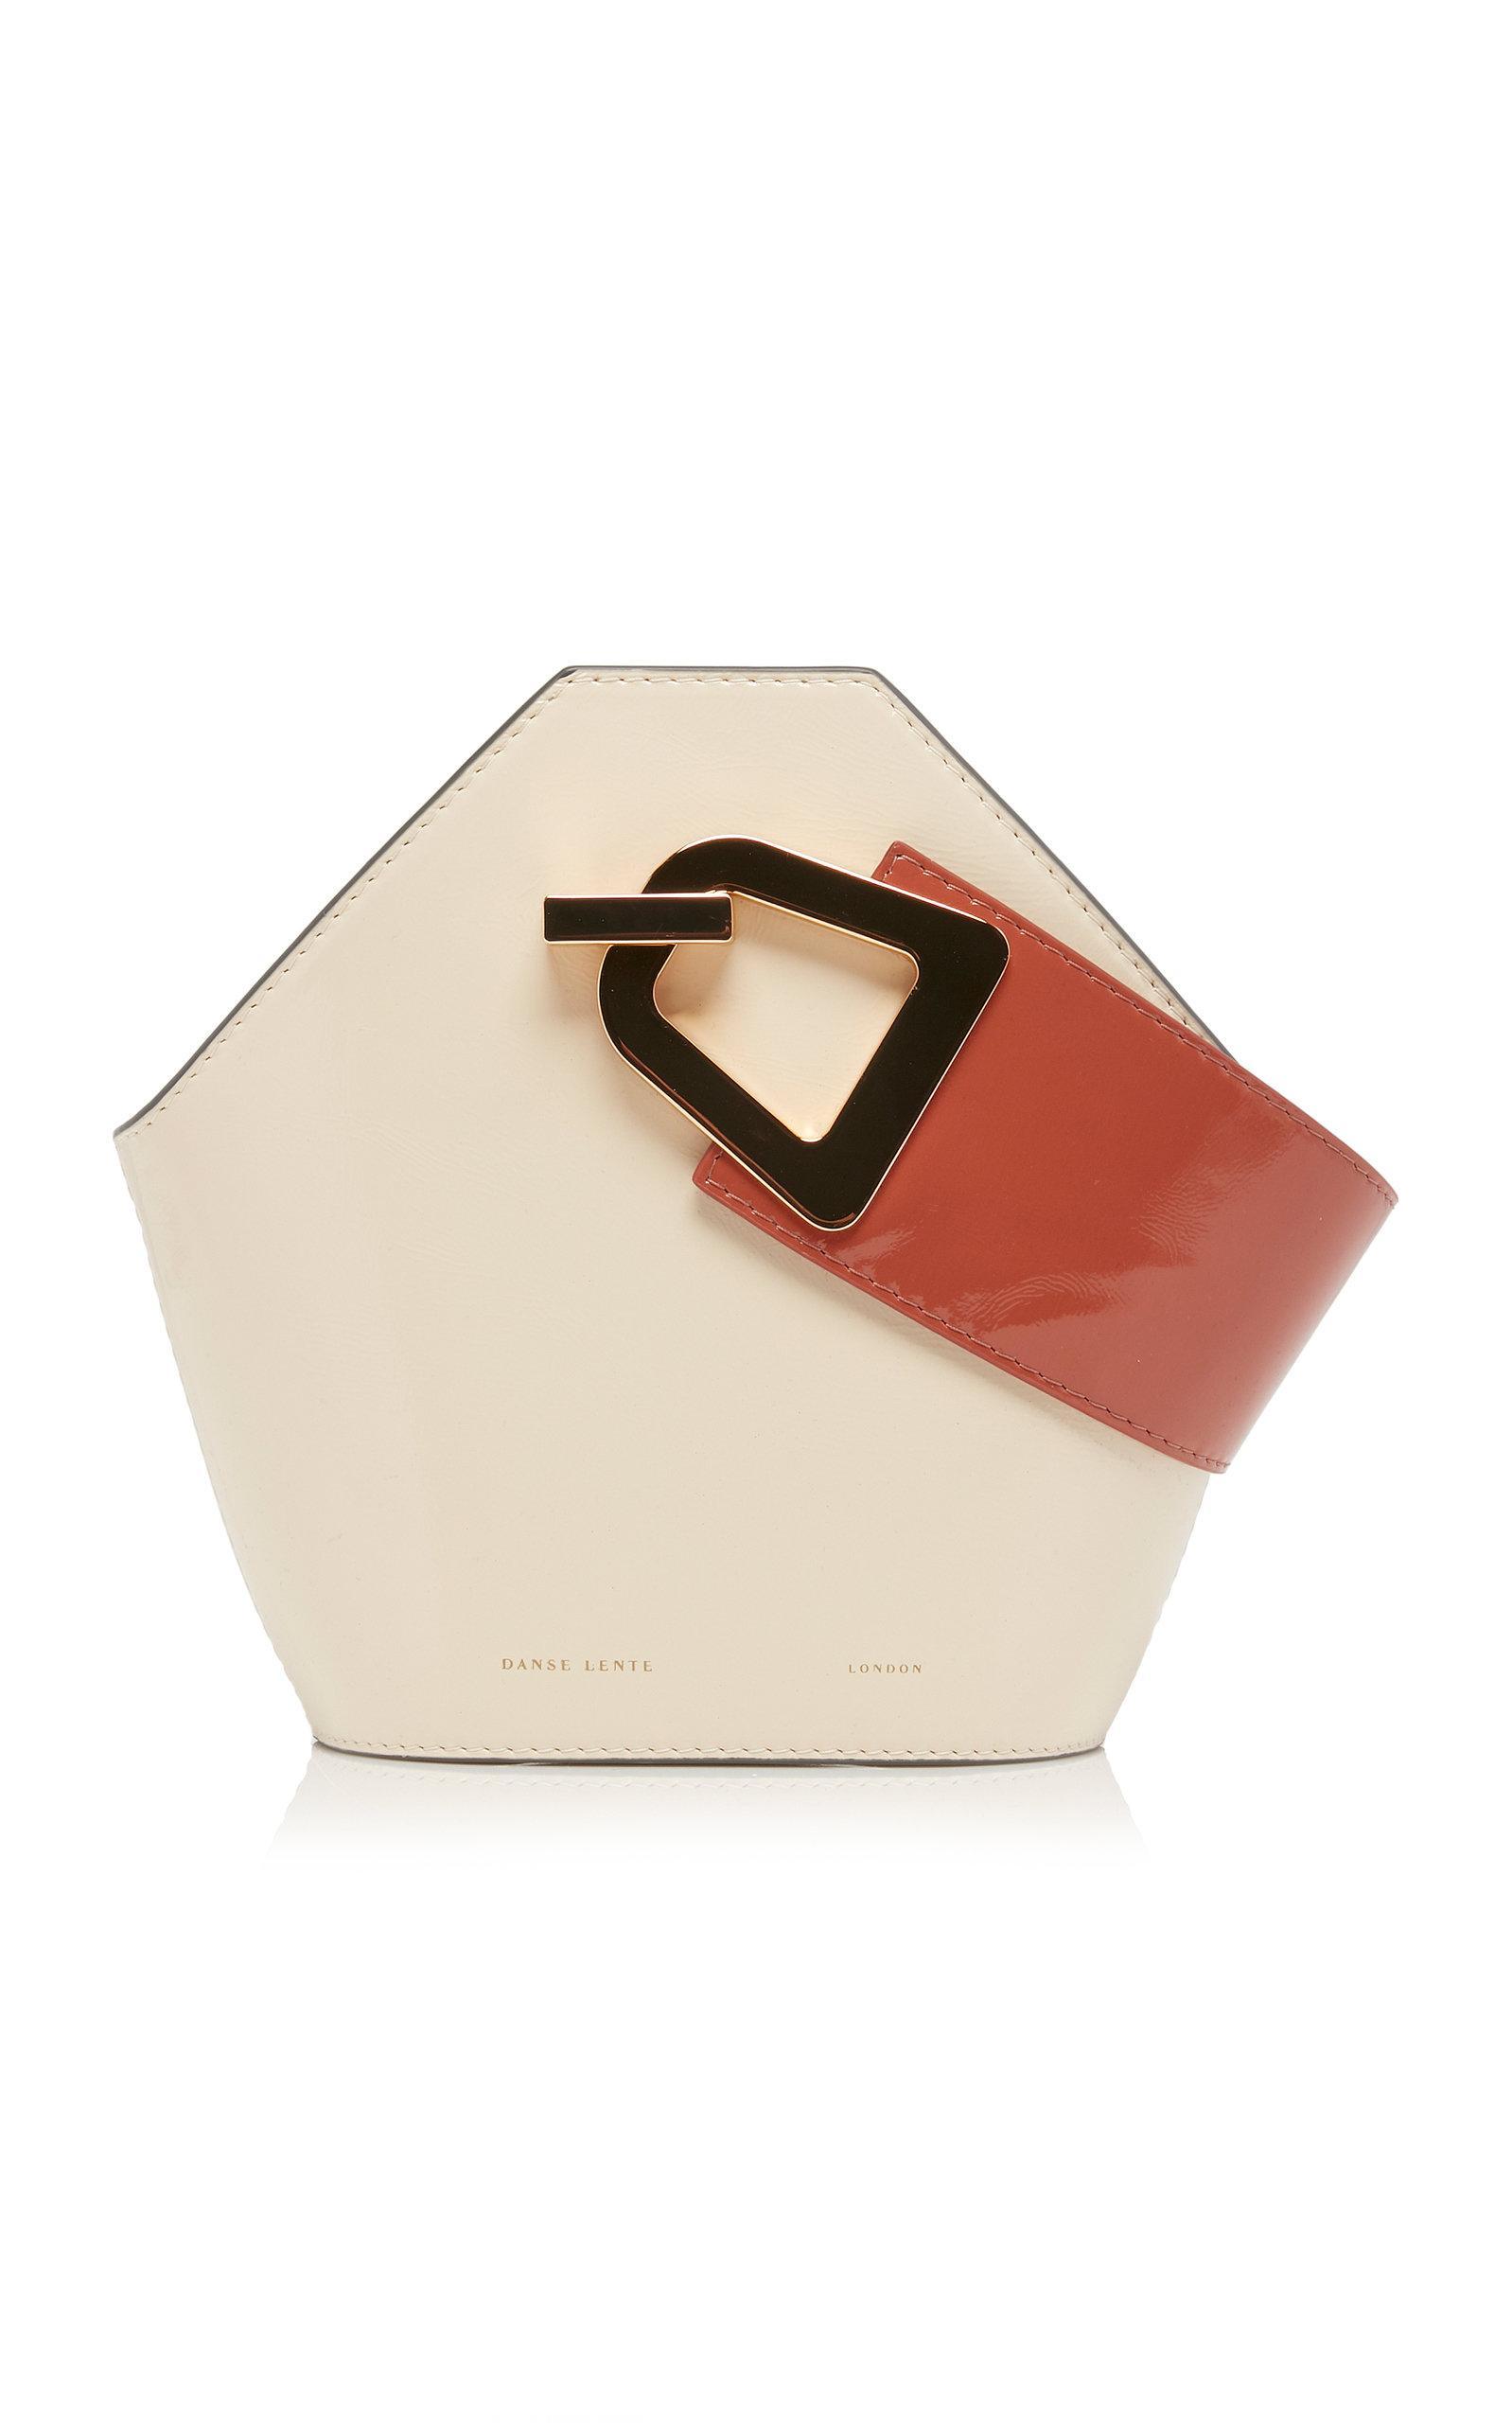 132a67bb7594 Danse Lente - White Johnny Patent Leather Mini Bag - Lyst. View fullscreen